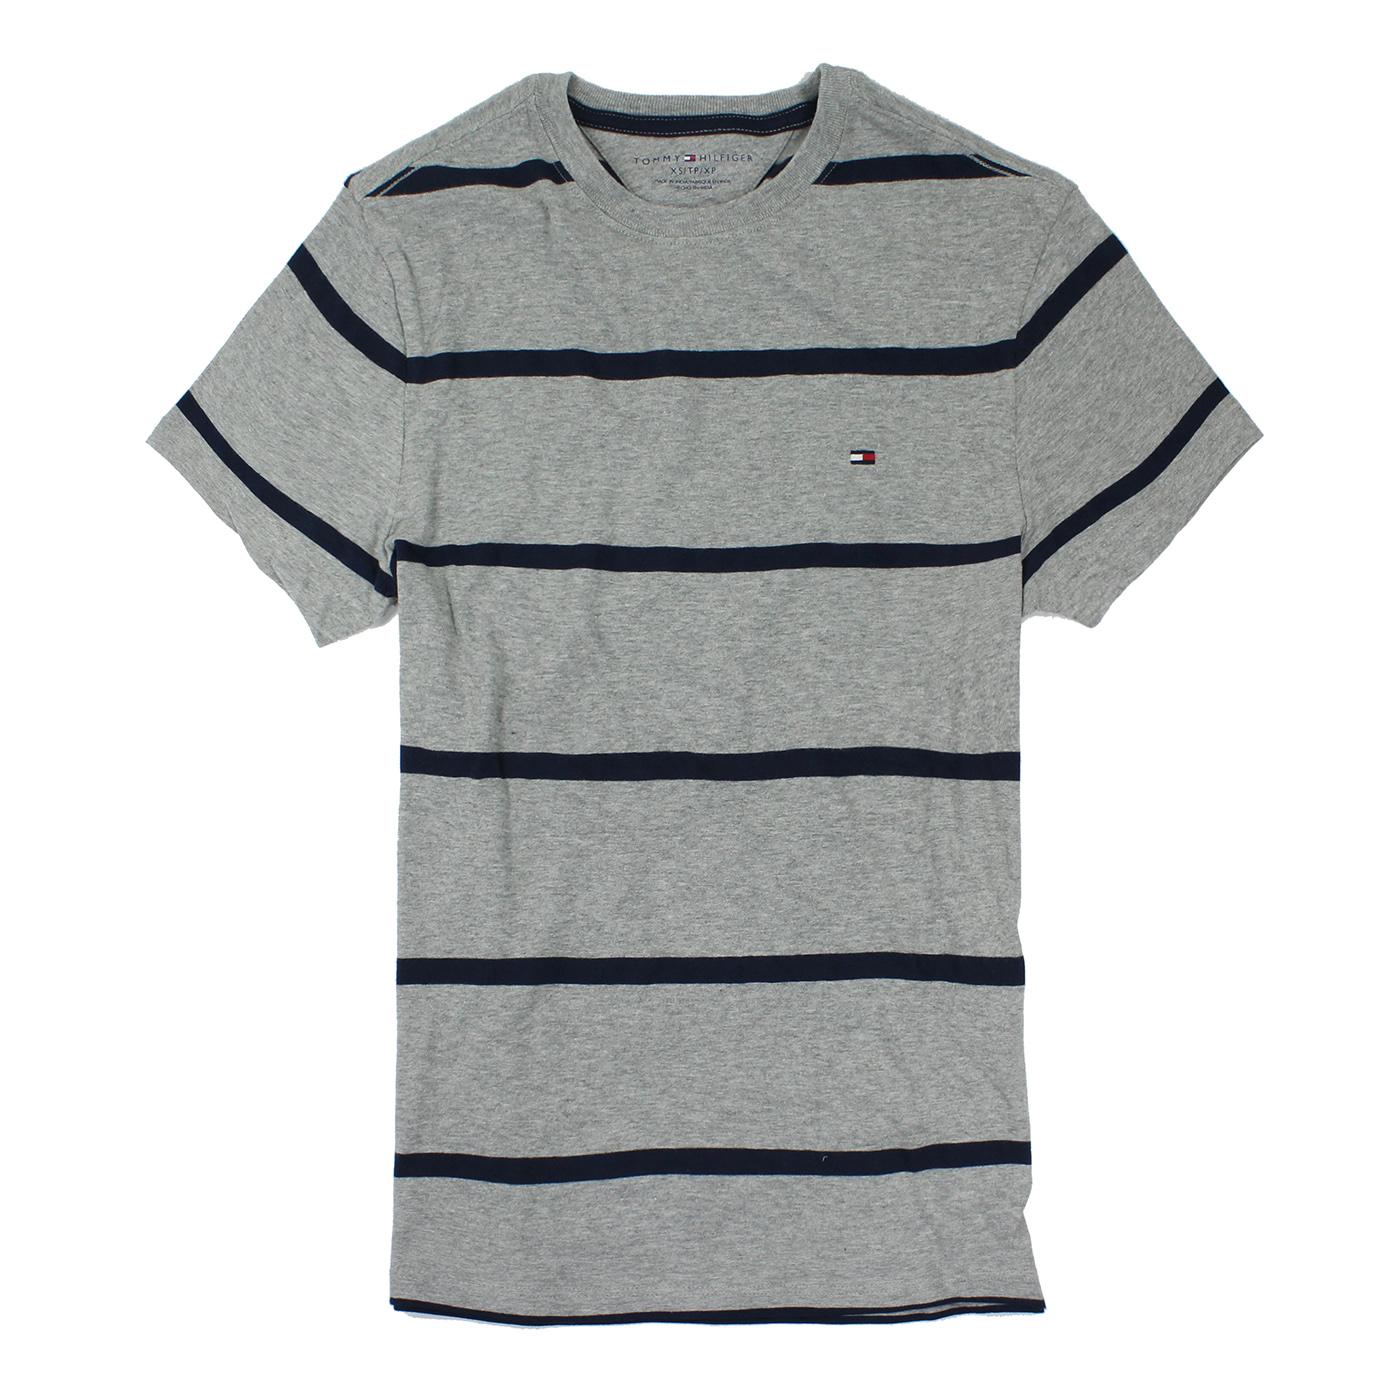 美國百分百【Tommy Hilfiger 】T恤 TH 男 圓領 T-shirt 短袖 條紋 灰色 XS號 E675